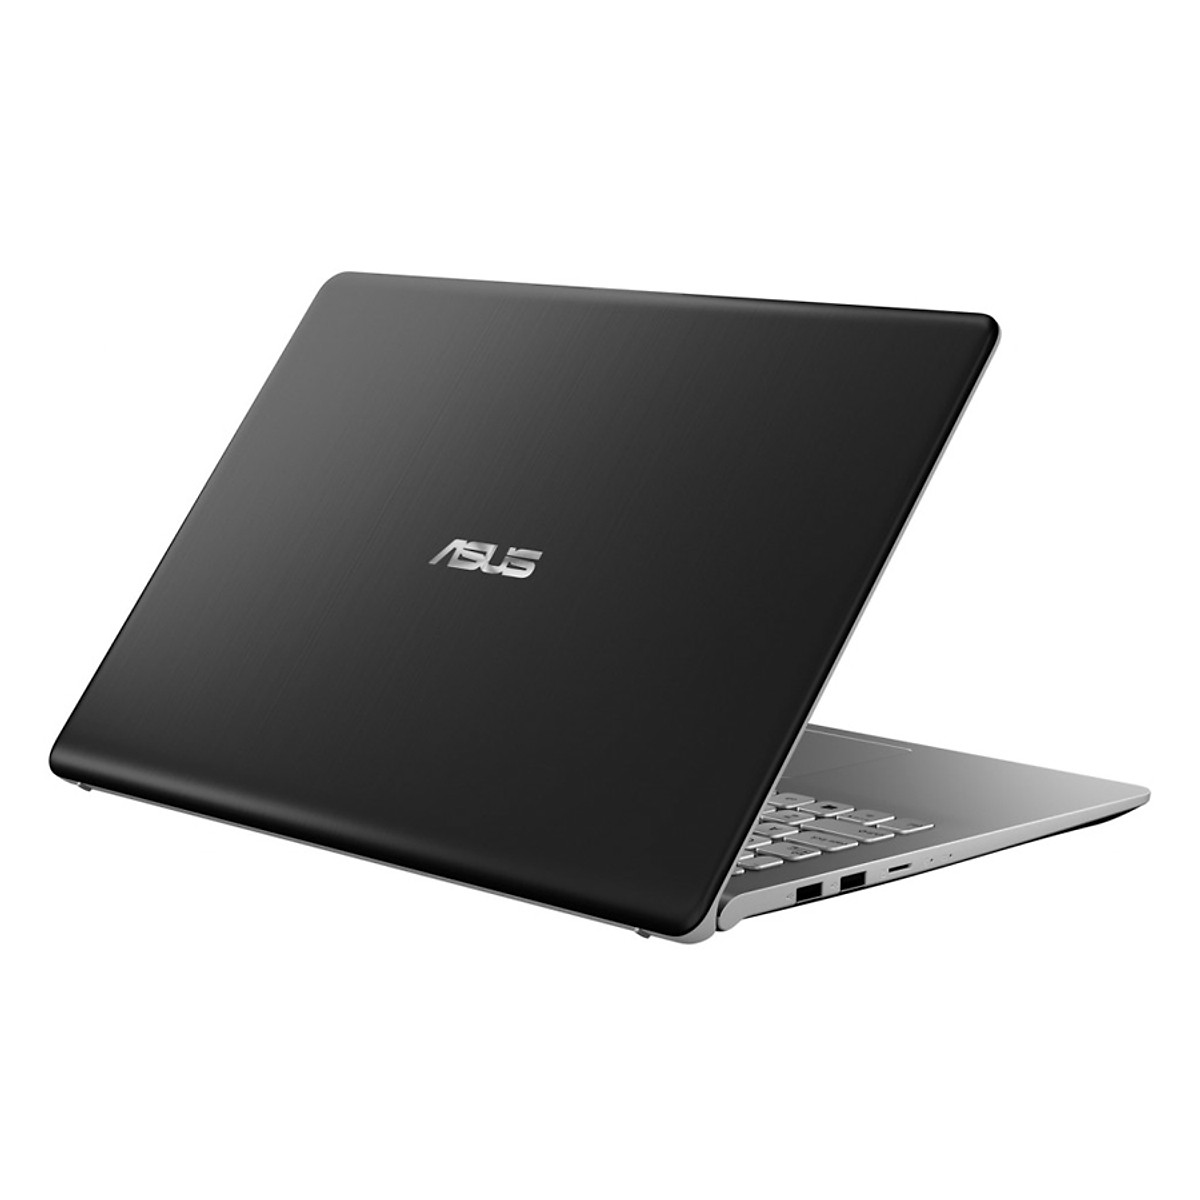 Asus   Máy tính xách tay - Laptop    Laptop Asus Vivobook S14 S430UA-EB132T Core i5-8250U/Win10 (14